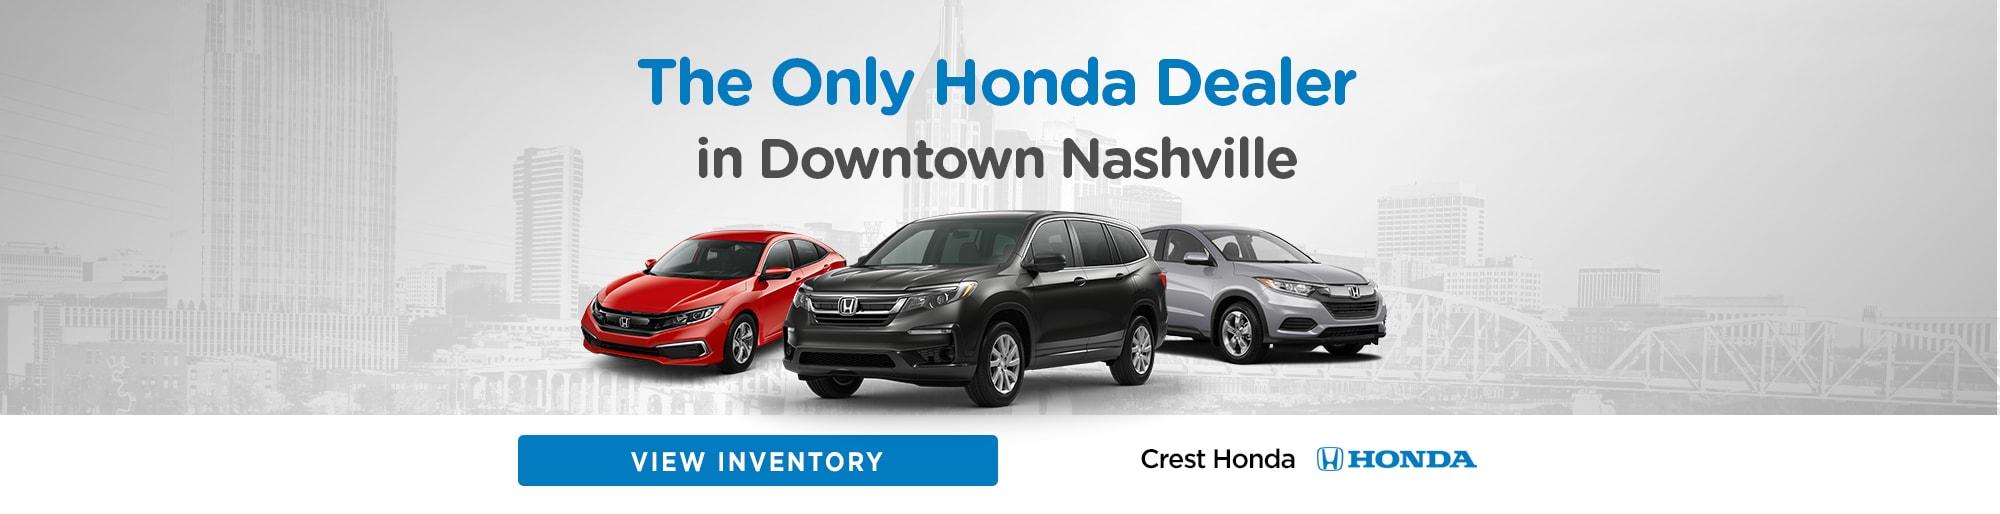 Honda Dealers In Tennessee >> Crest Honda New Used Honda Dealer Serving Nashville Tn